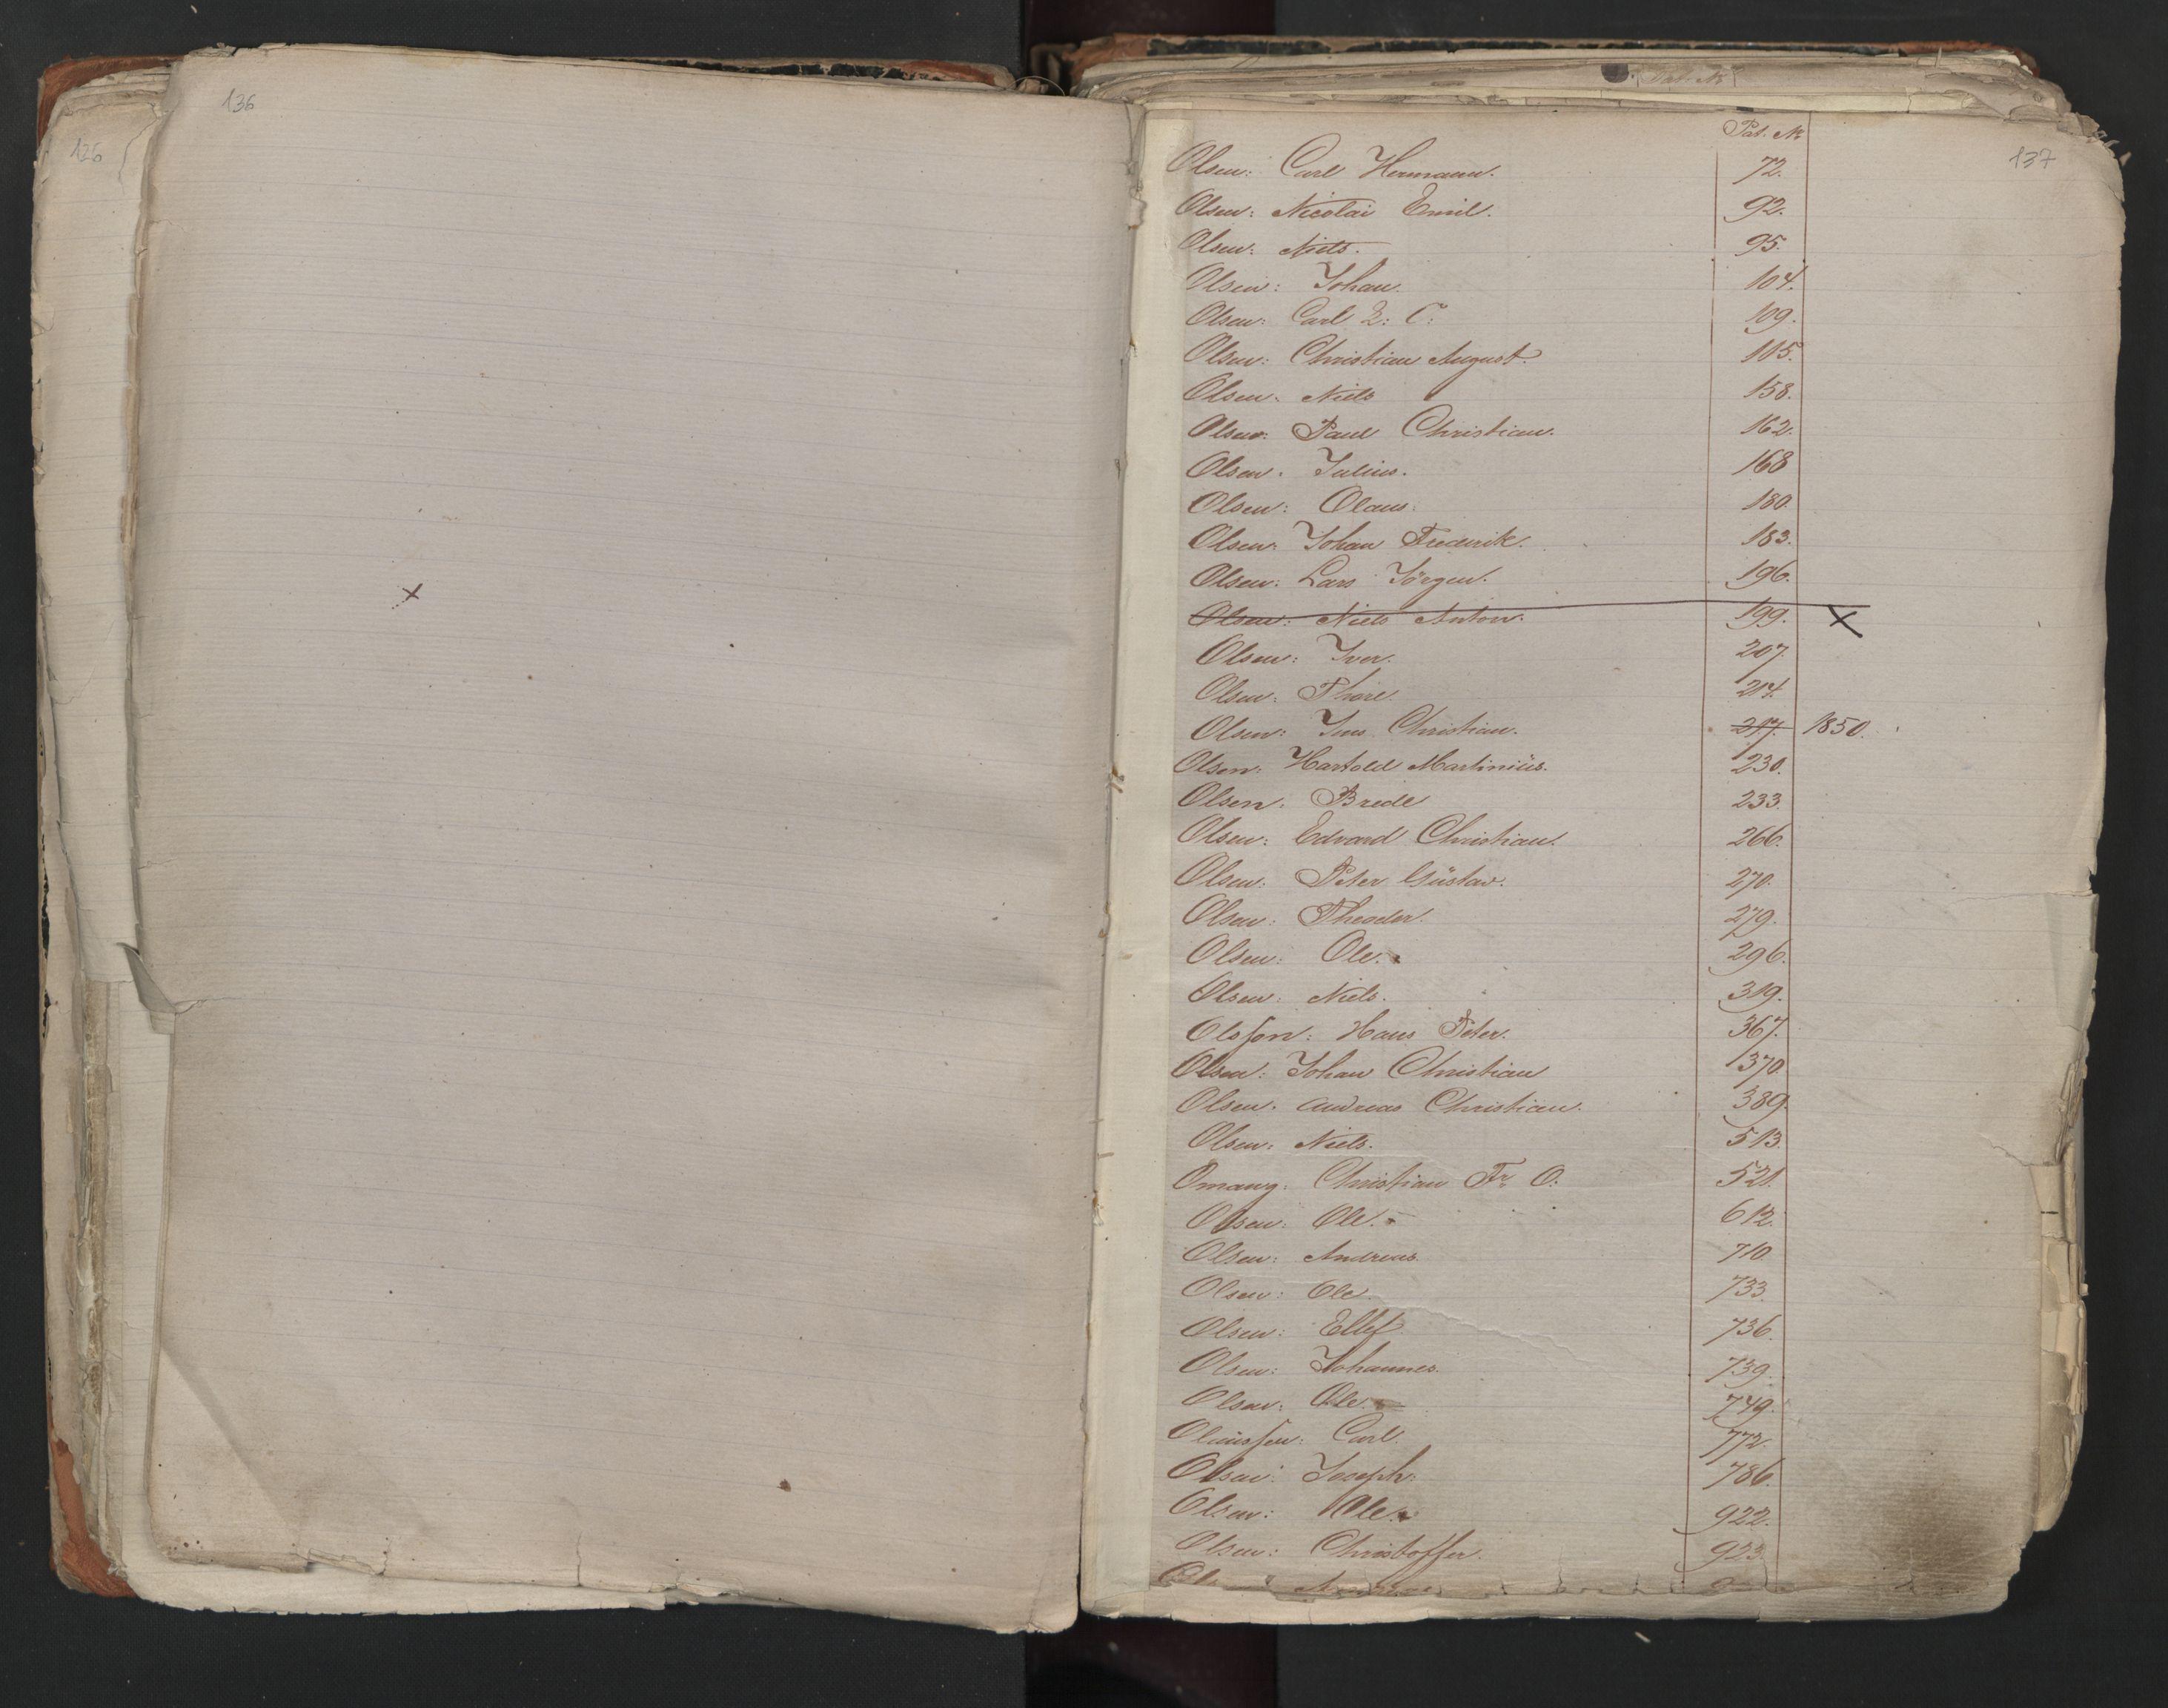 SAO, Oslo sjømannskontor, F/Fa/L0001: Register for Kristiania krets, 1866-1891, s. 136-137